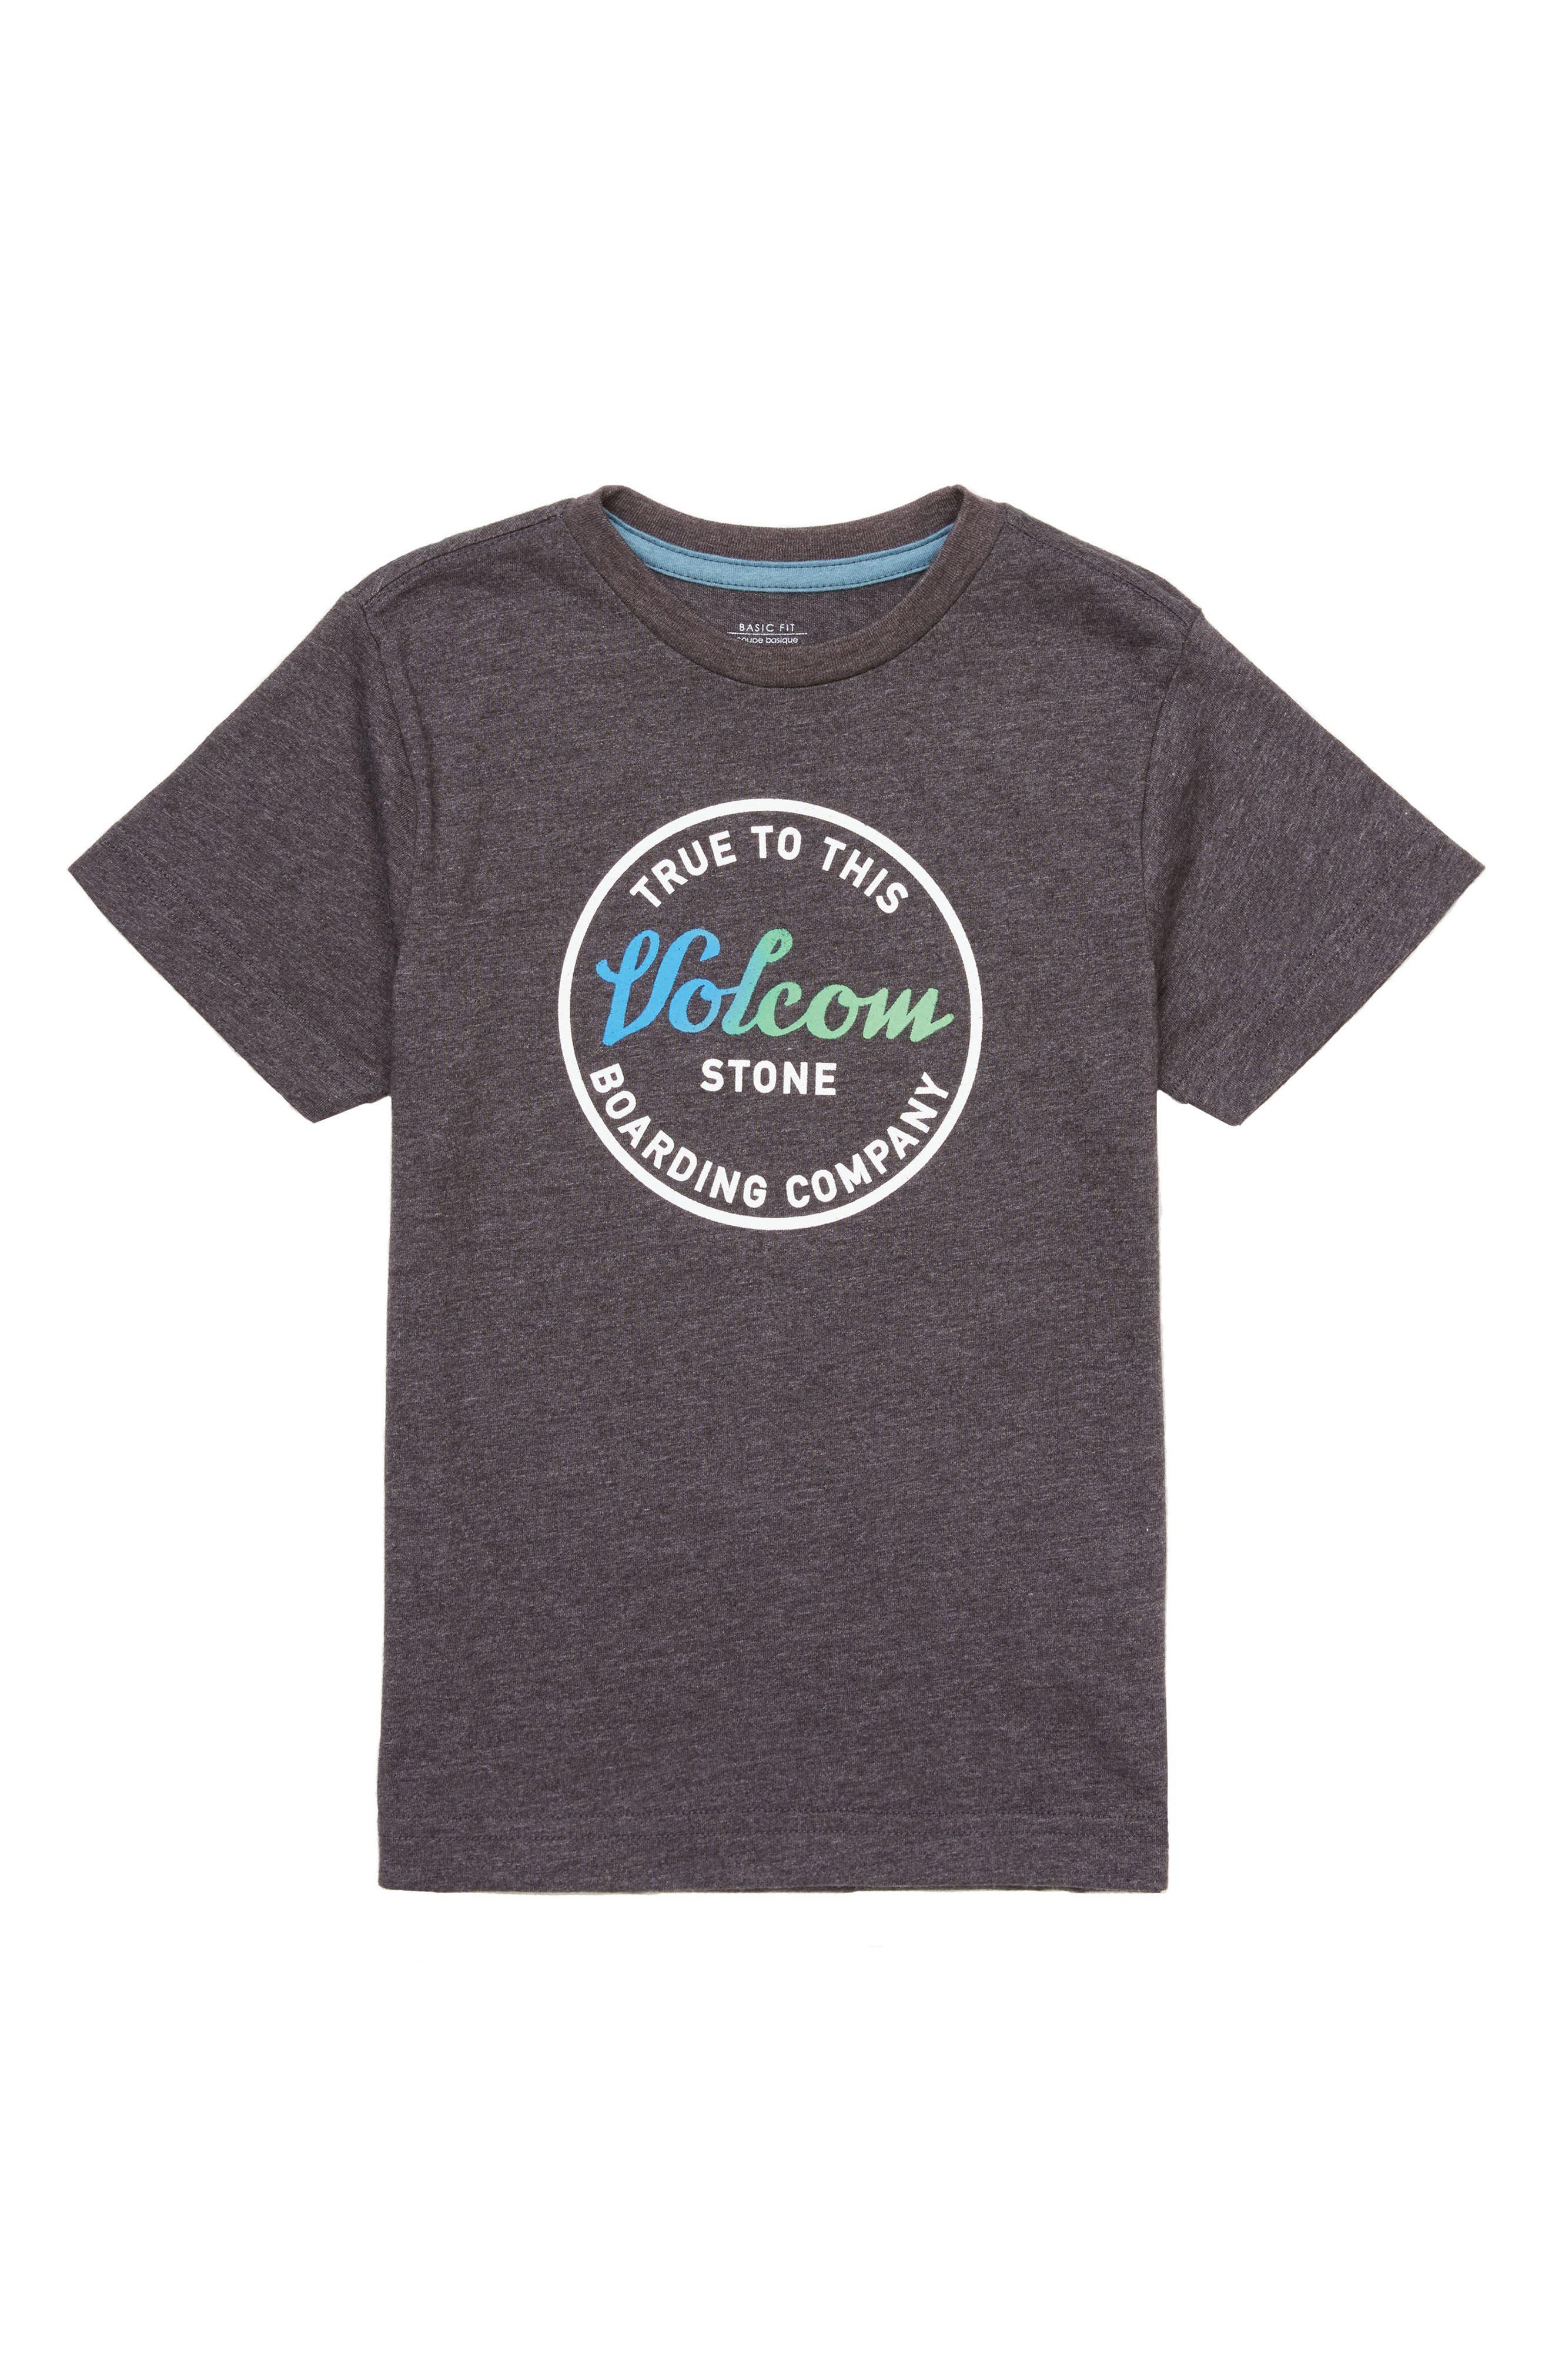 Volcom Scrippy Graphic T-Shirt (Toddler Boys & Little Boys)